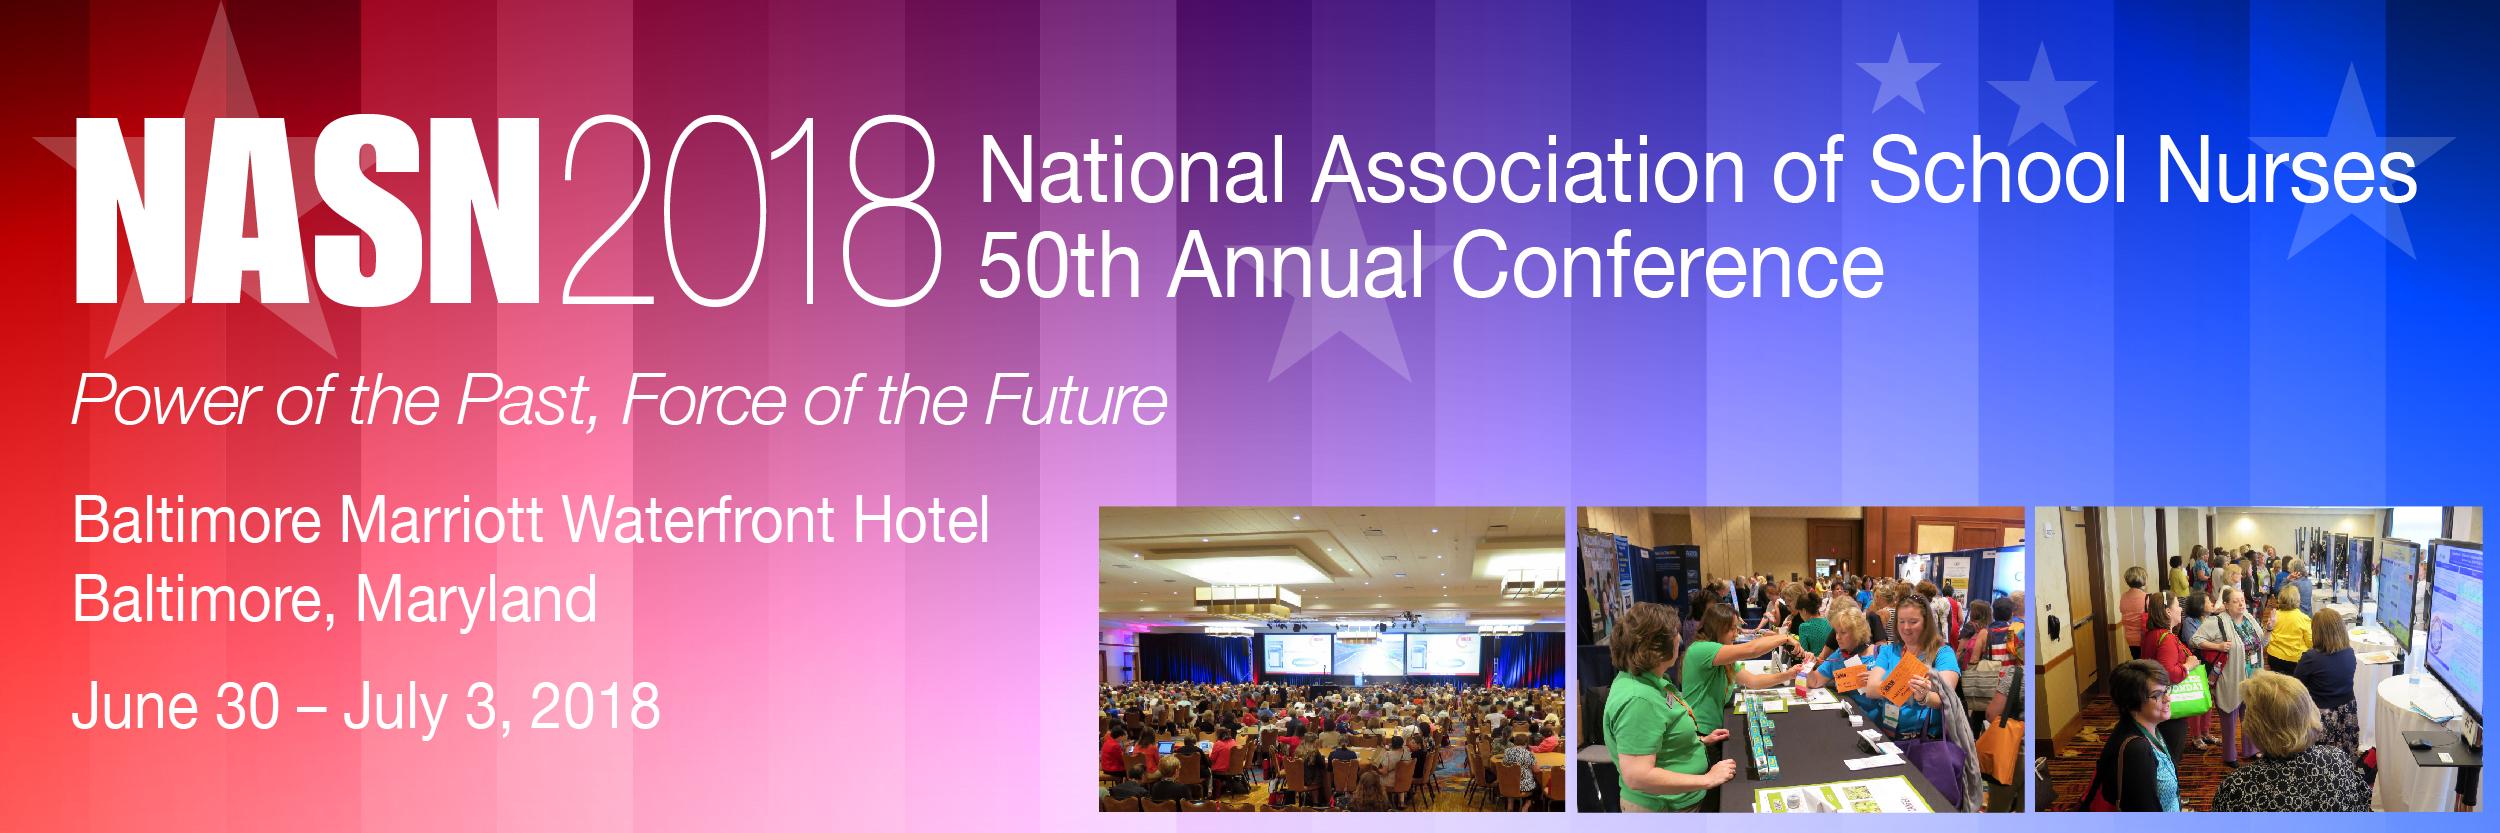 NASN 2018 Conference